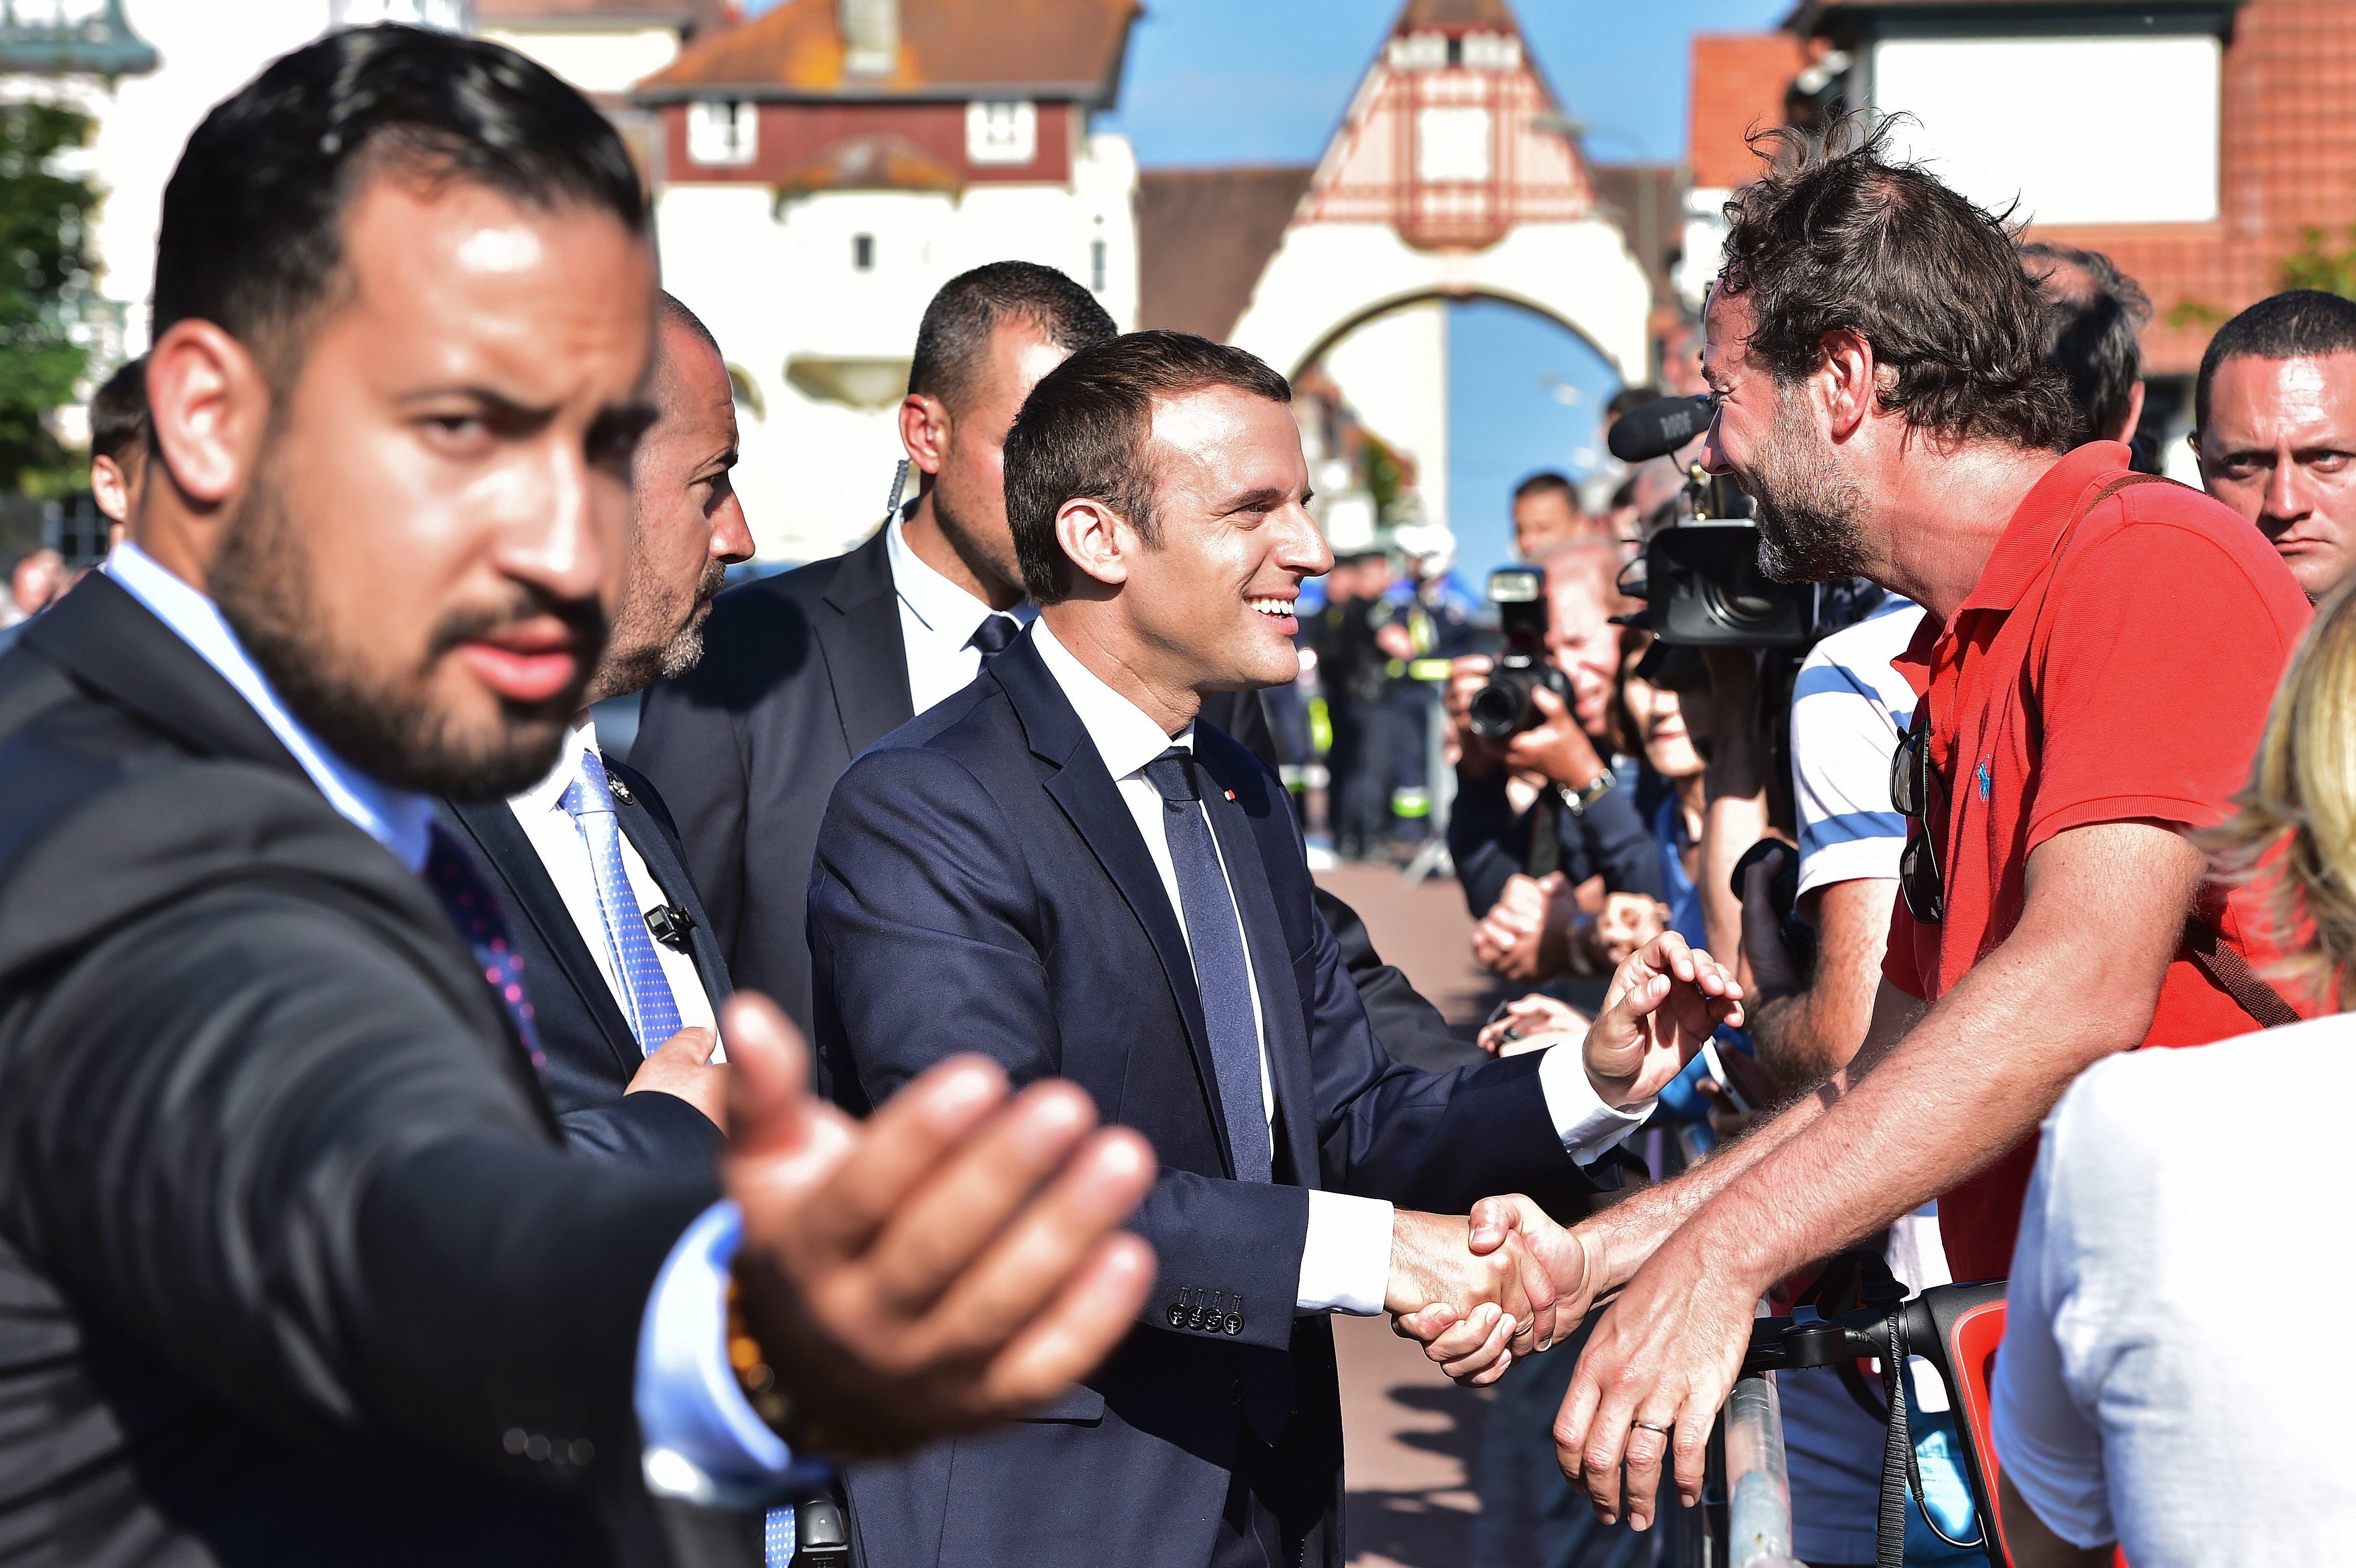 Macron Bodyguard Beats Protester In Paris